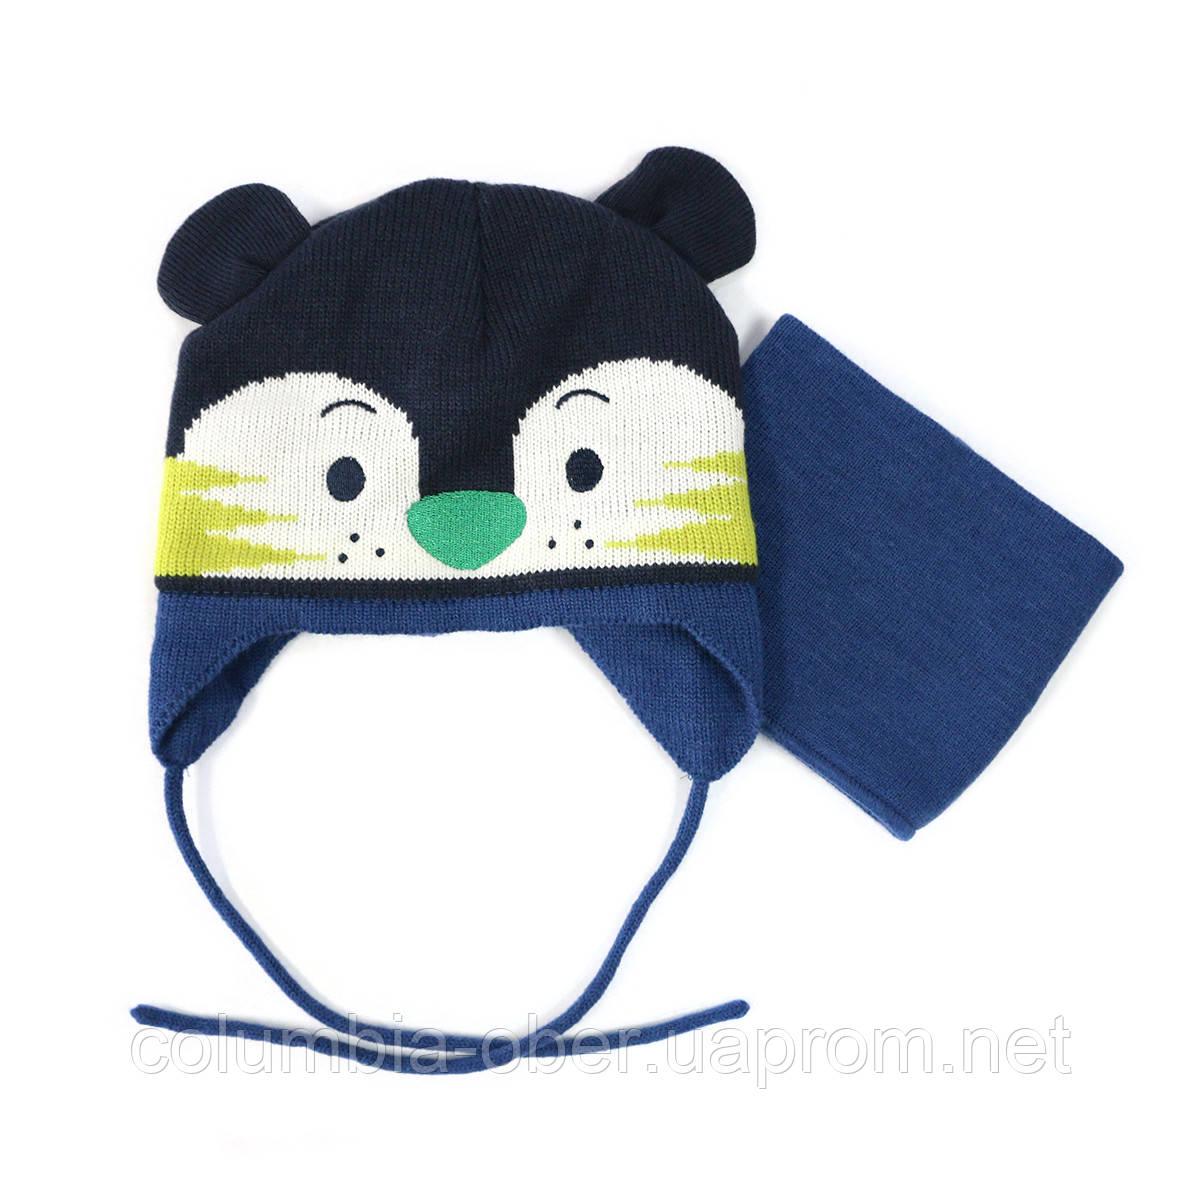 Зимняя шапка и манишка для мальчика PELUCHE11 BG ACC F16 Federal Blue. Размер 0/6 мес - 2/3.